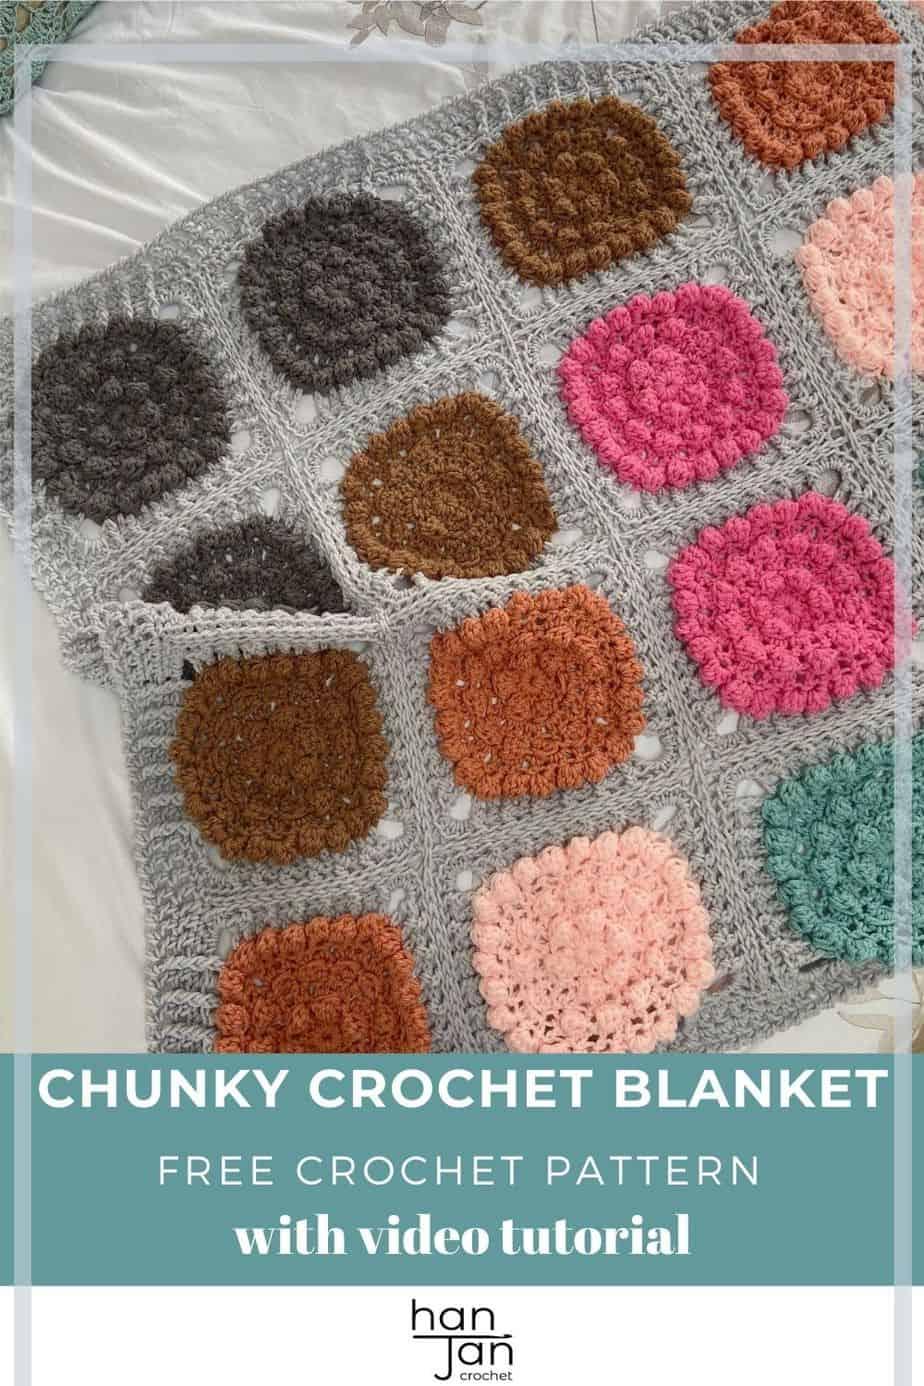 Chunky Crochet Blanket Pattern Super Alexa Blanket pin 3